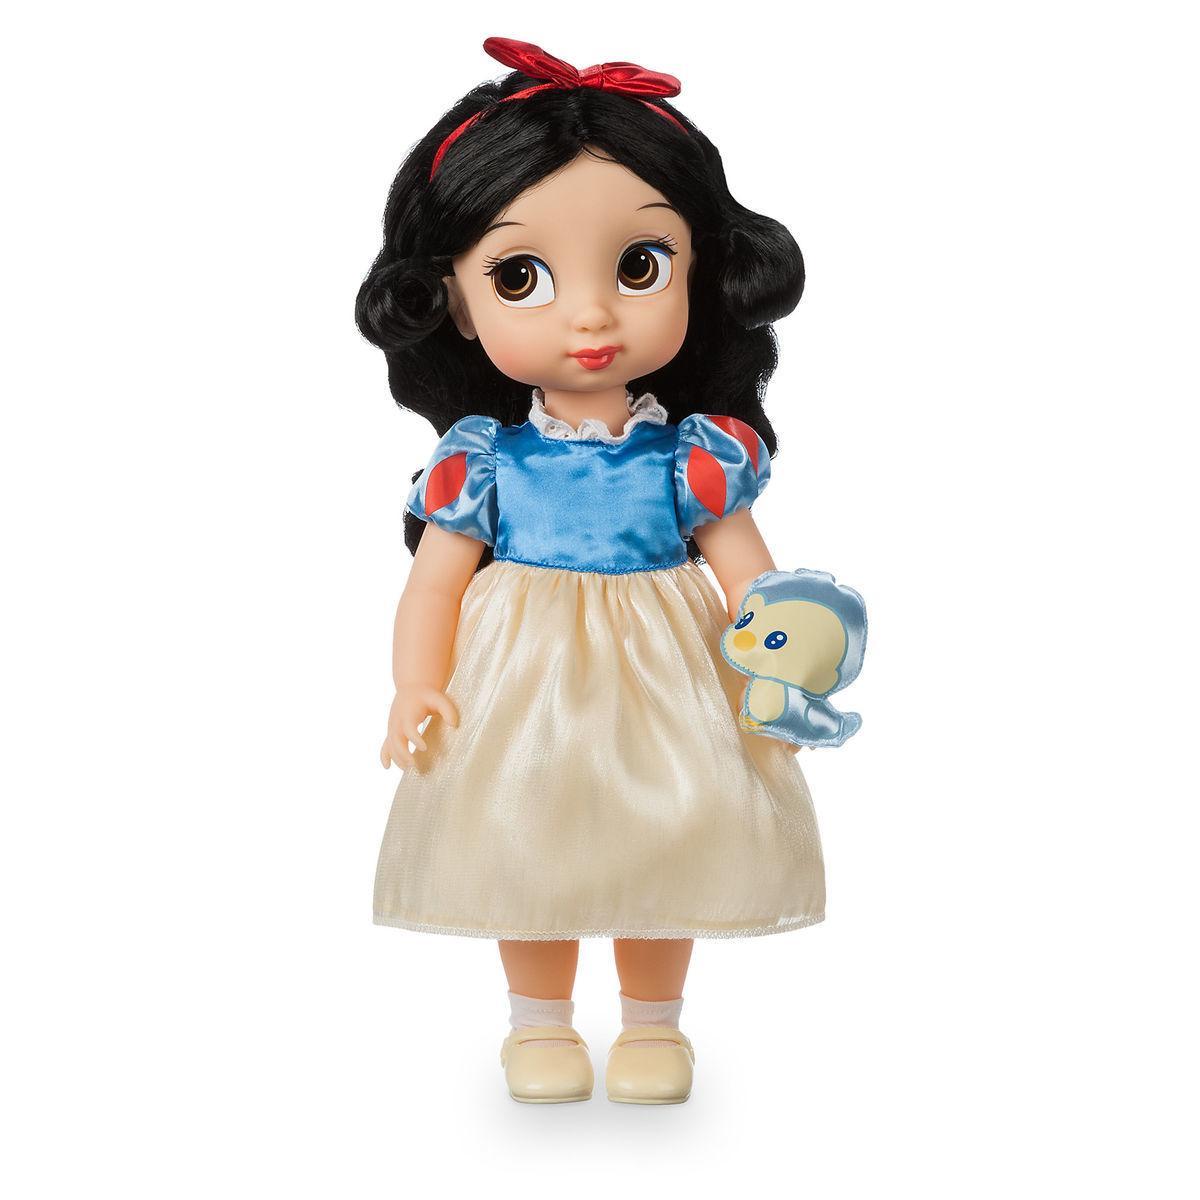 Disney Animators Дисней Аниматор Кукла малышка Белоснежка - Белоснежка и семь гномов